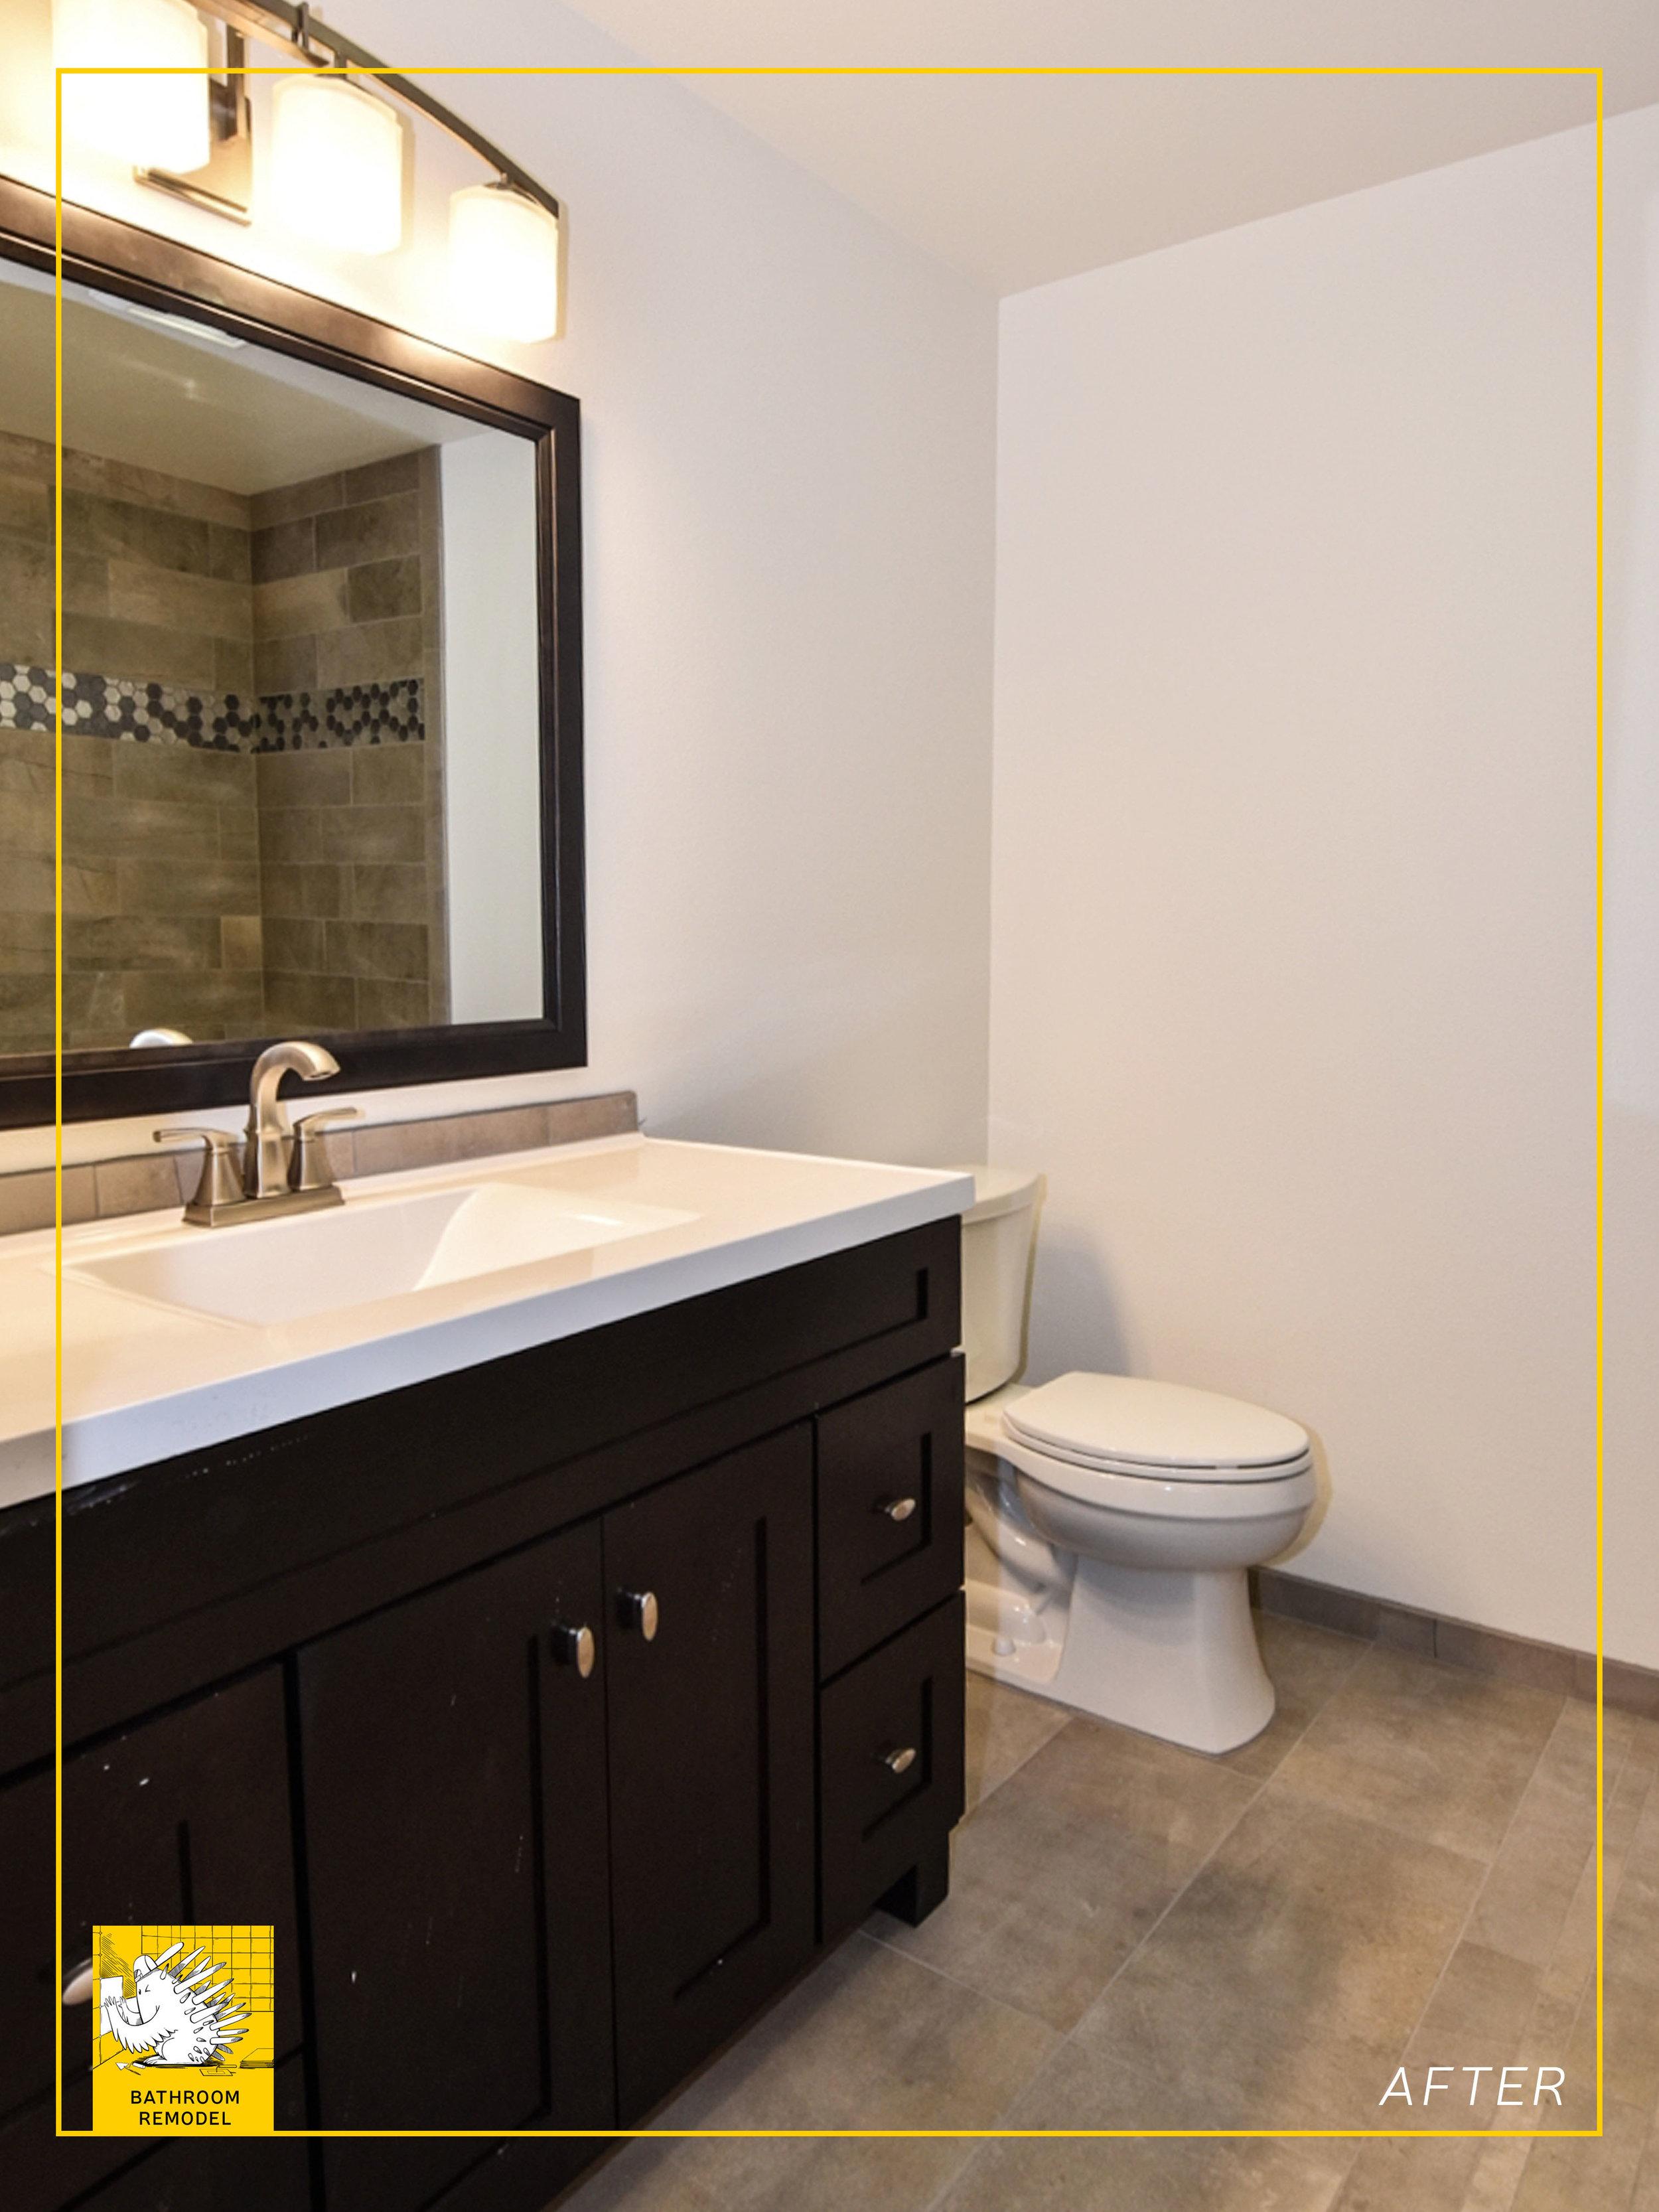 MT bathroom 1 after 1.jpg